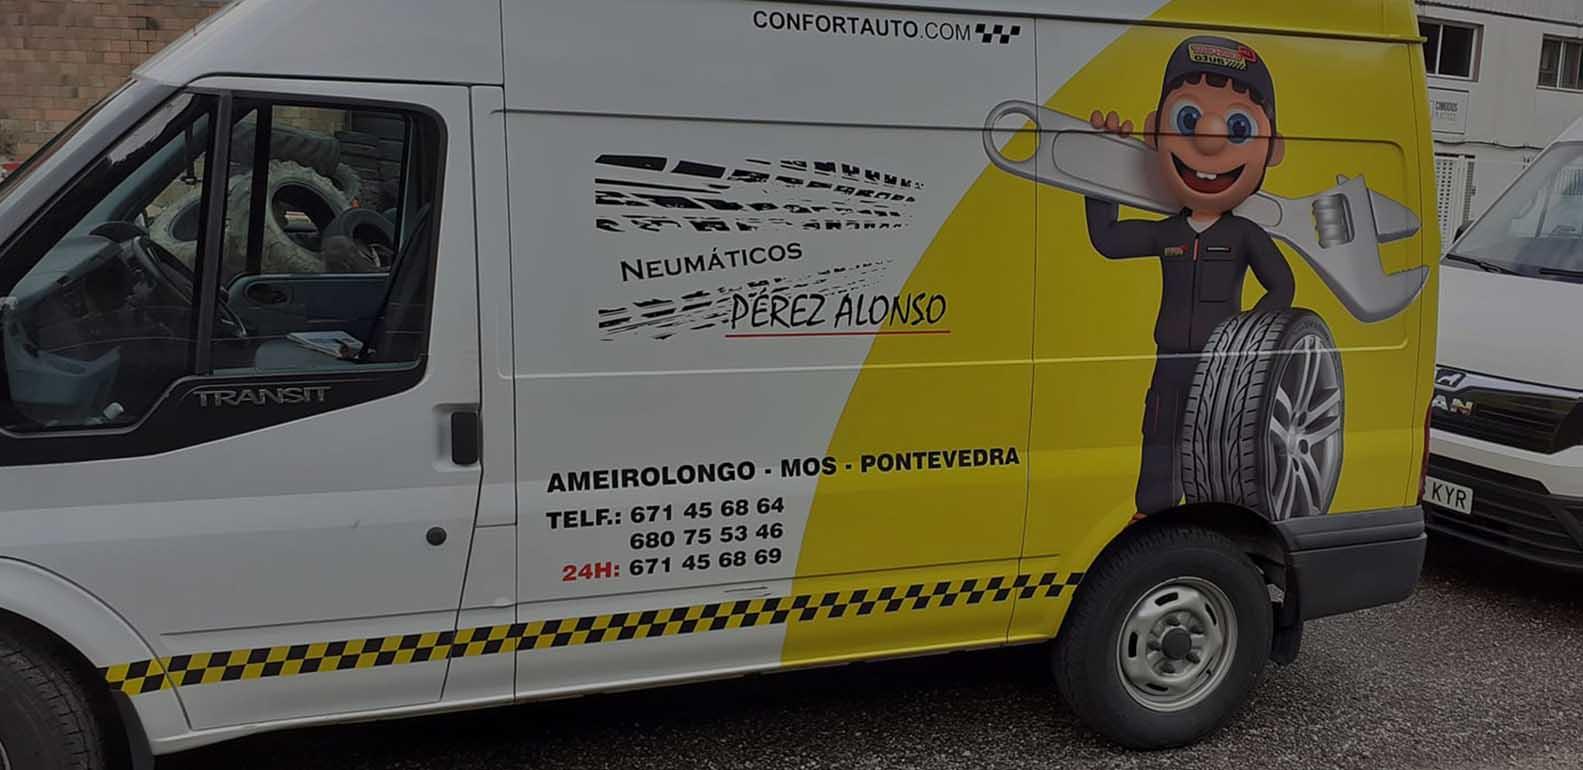 Neumáticos Pérez Alonso